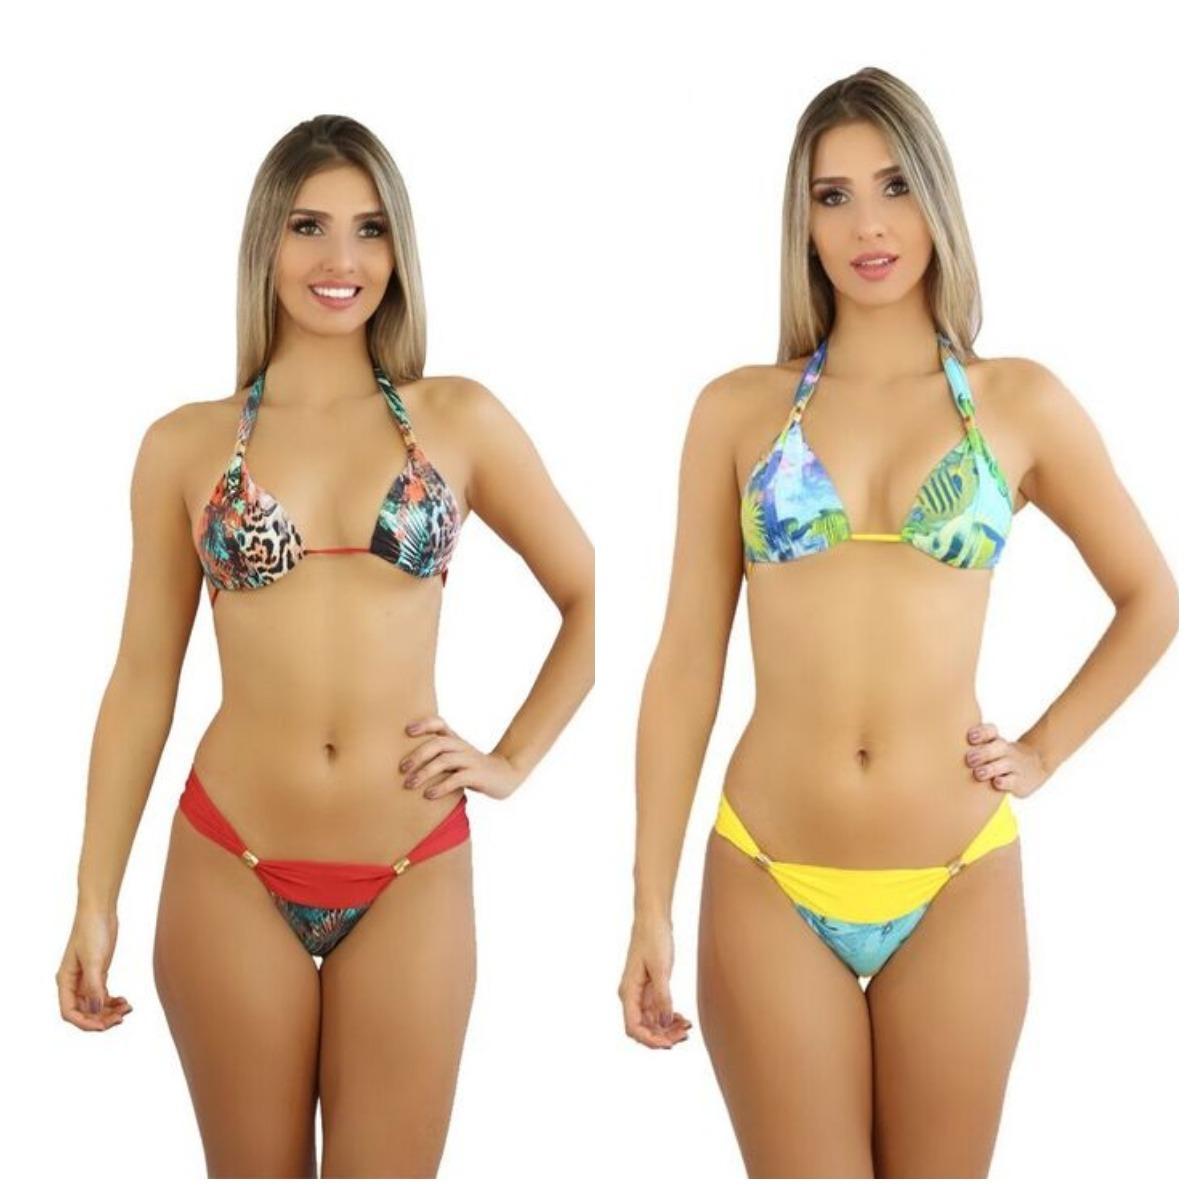 1b378dd1d30 biquinis 2018 moda praia biquinis baratos- z9 biquini lindo. Carregando  zoom.